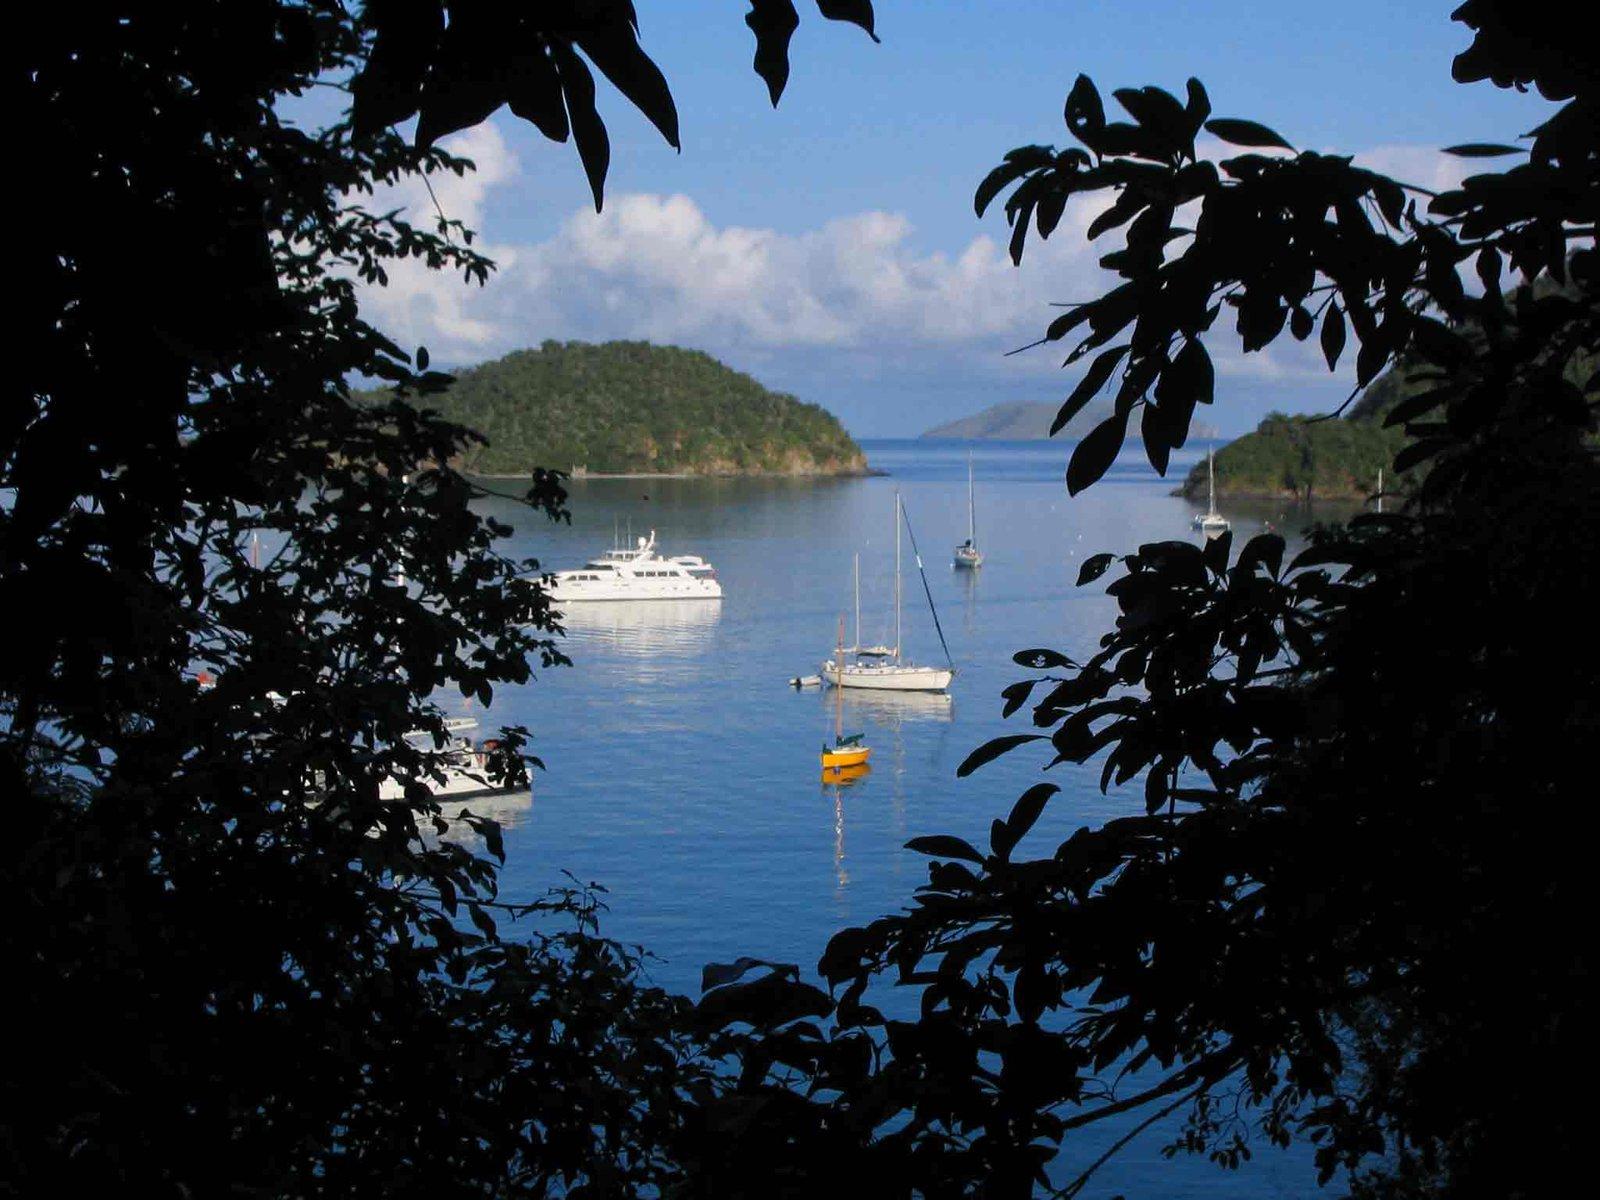 Over looking Maho Bay